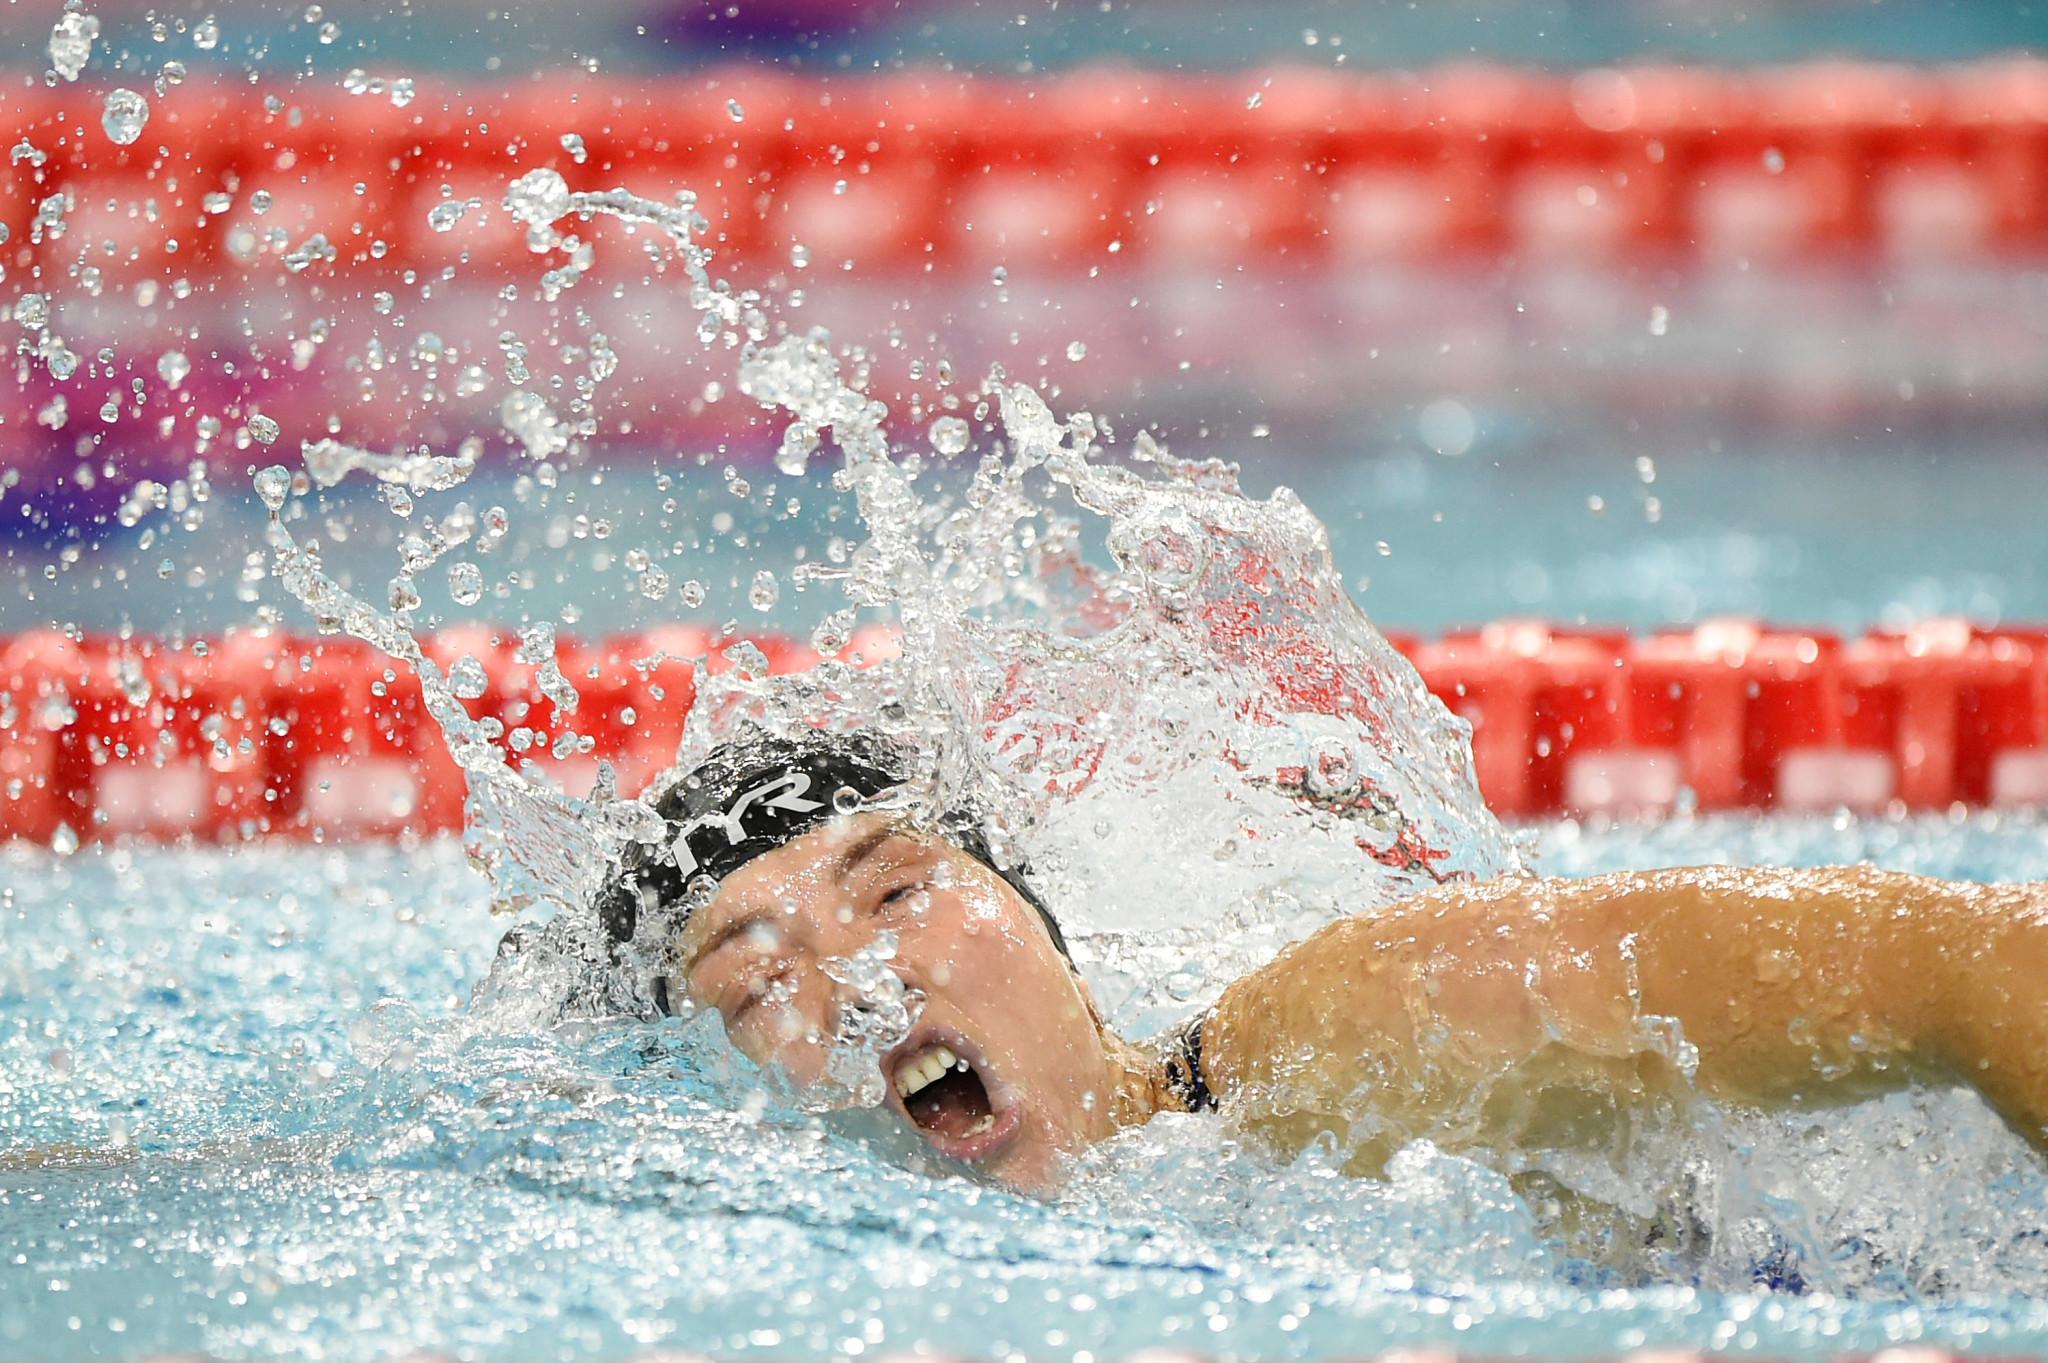 Silkina wins women's title at UIPM Modern Pentathlon World Championships